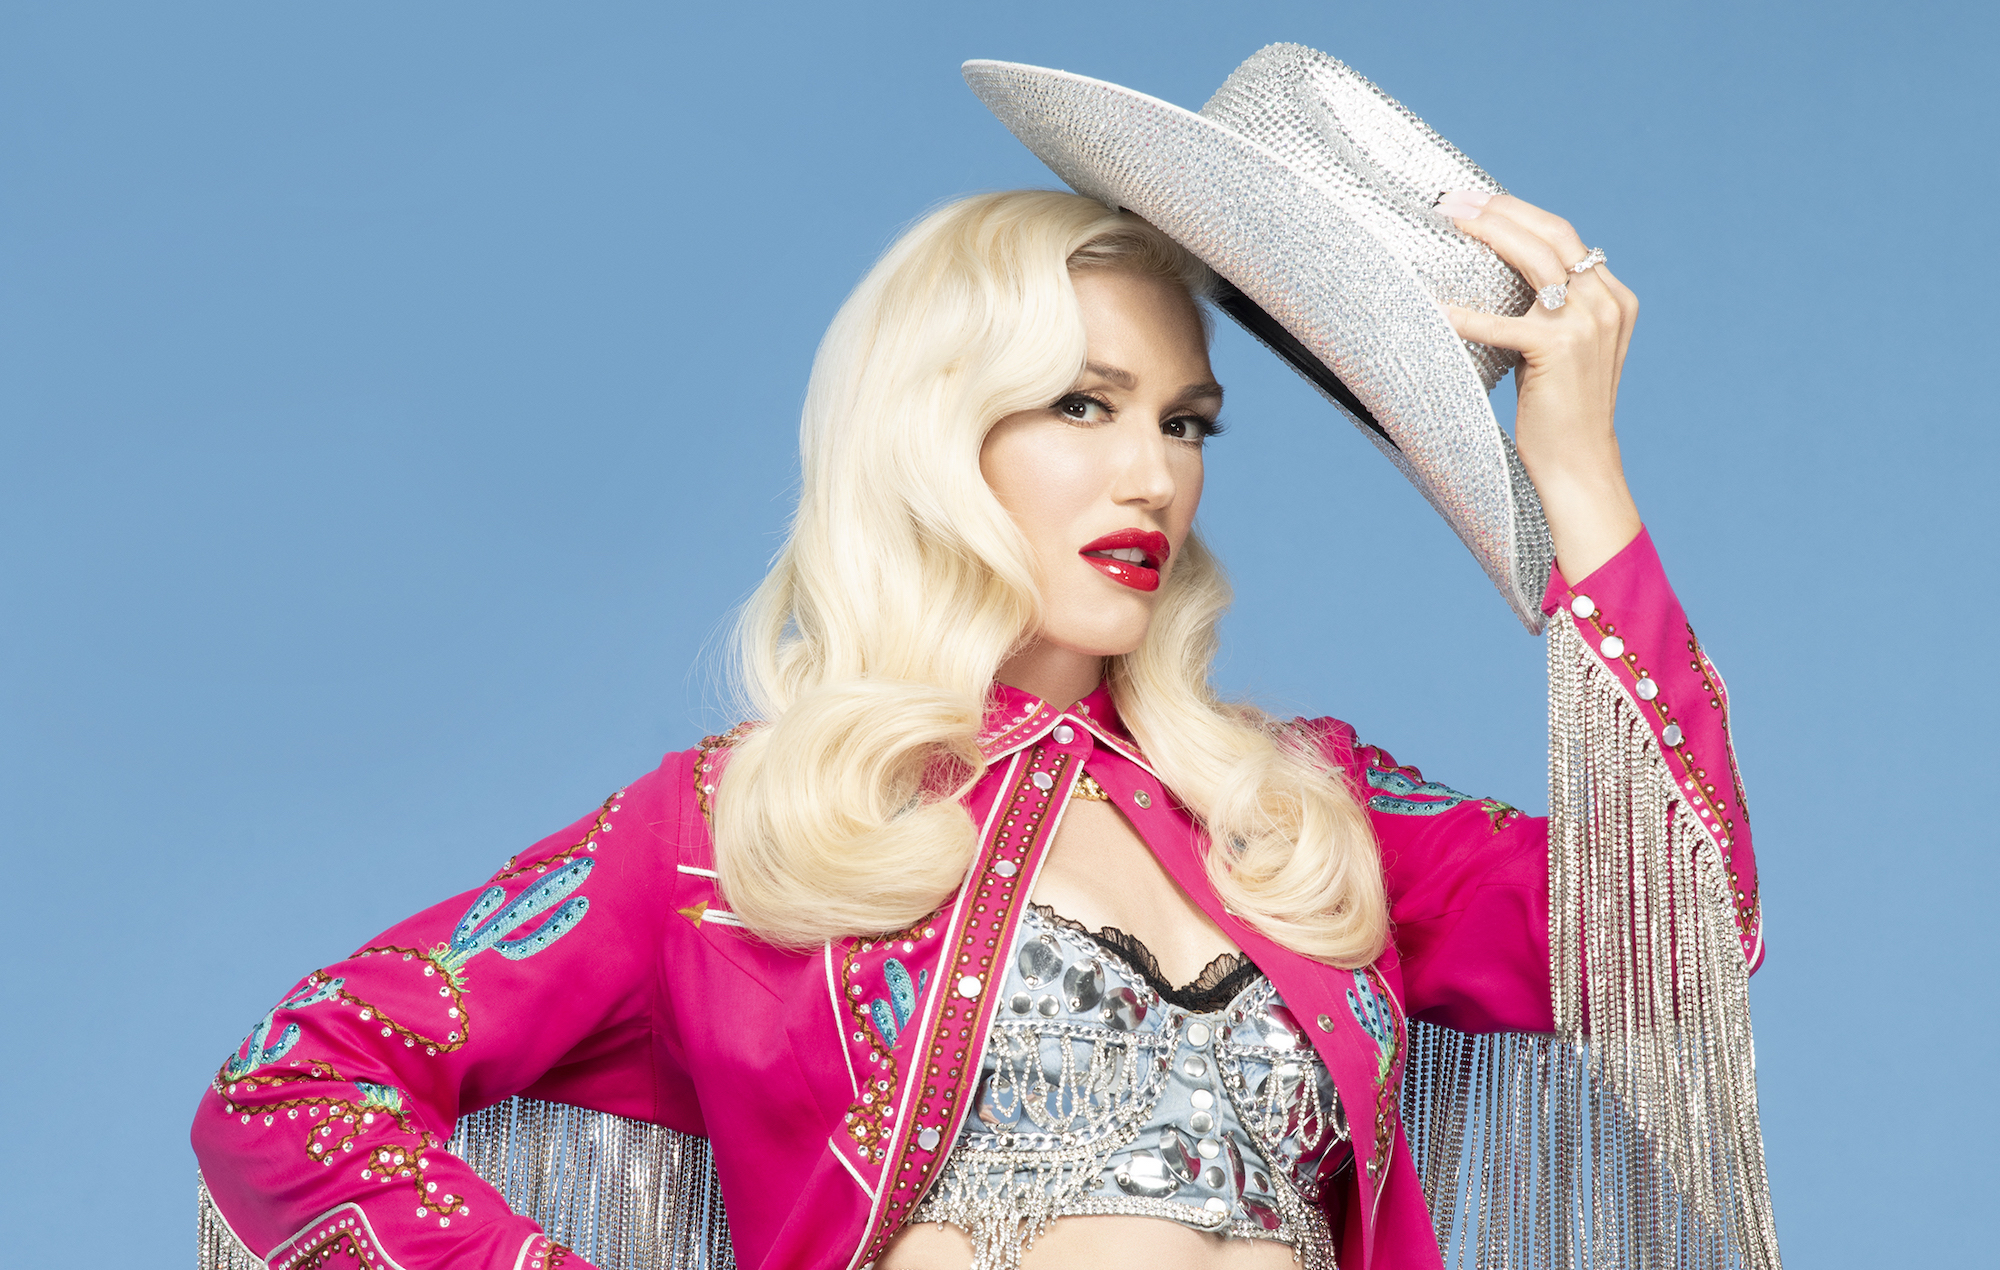 Gwen Stefani returns with sun-kissed new single 'Slow Clap'